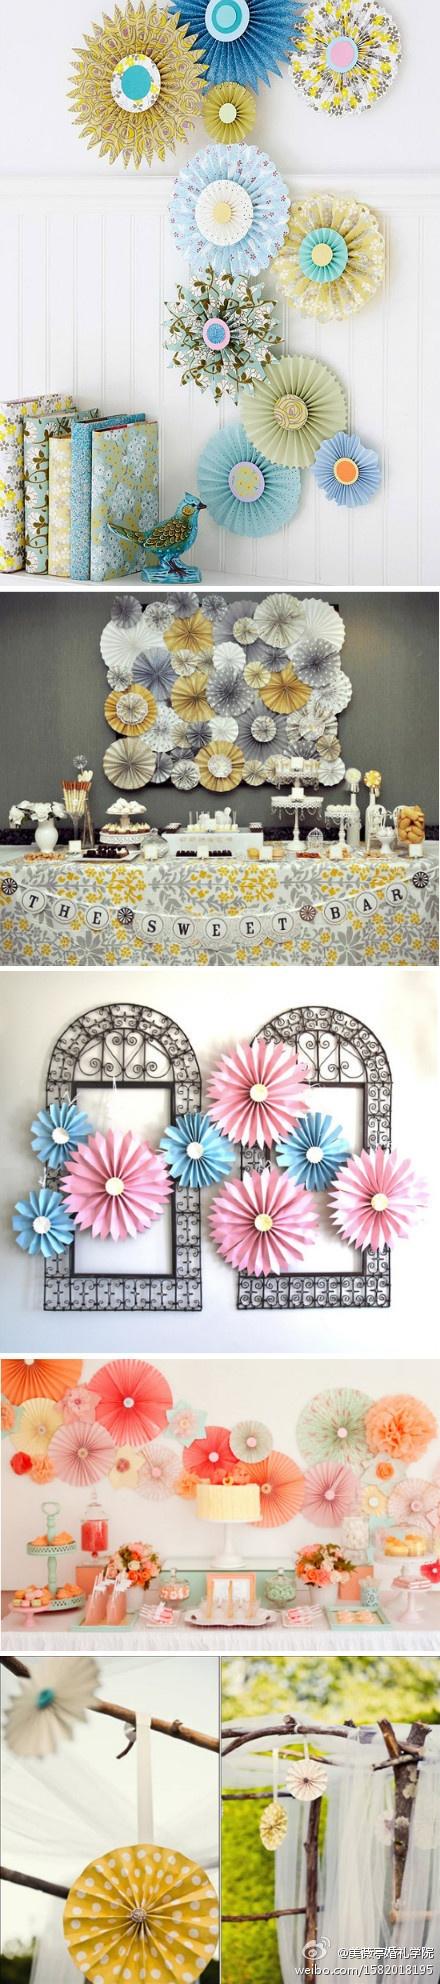 Decorao De Parede Craft Ideas Pinterest Birthdays